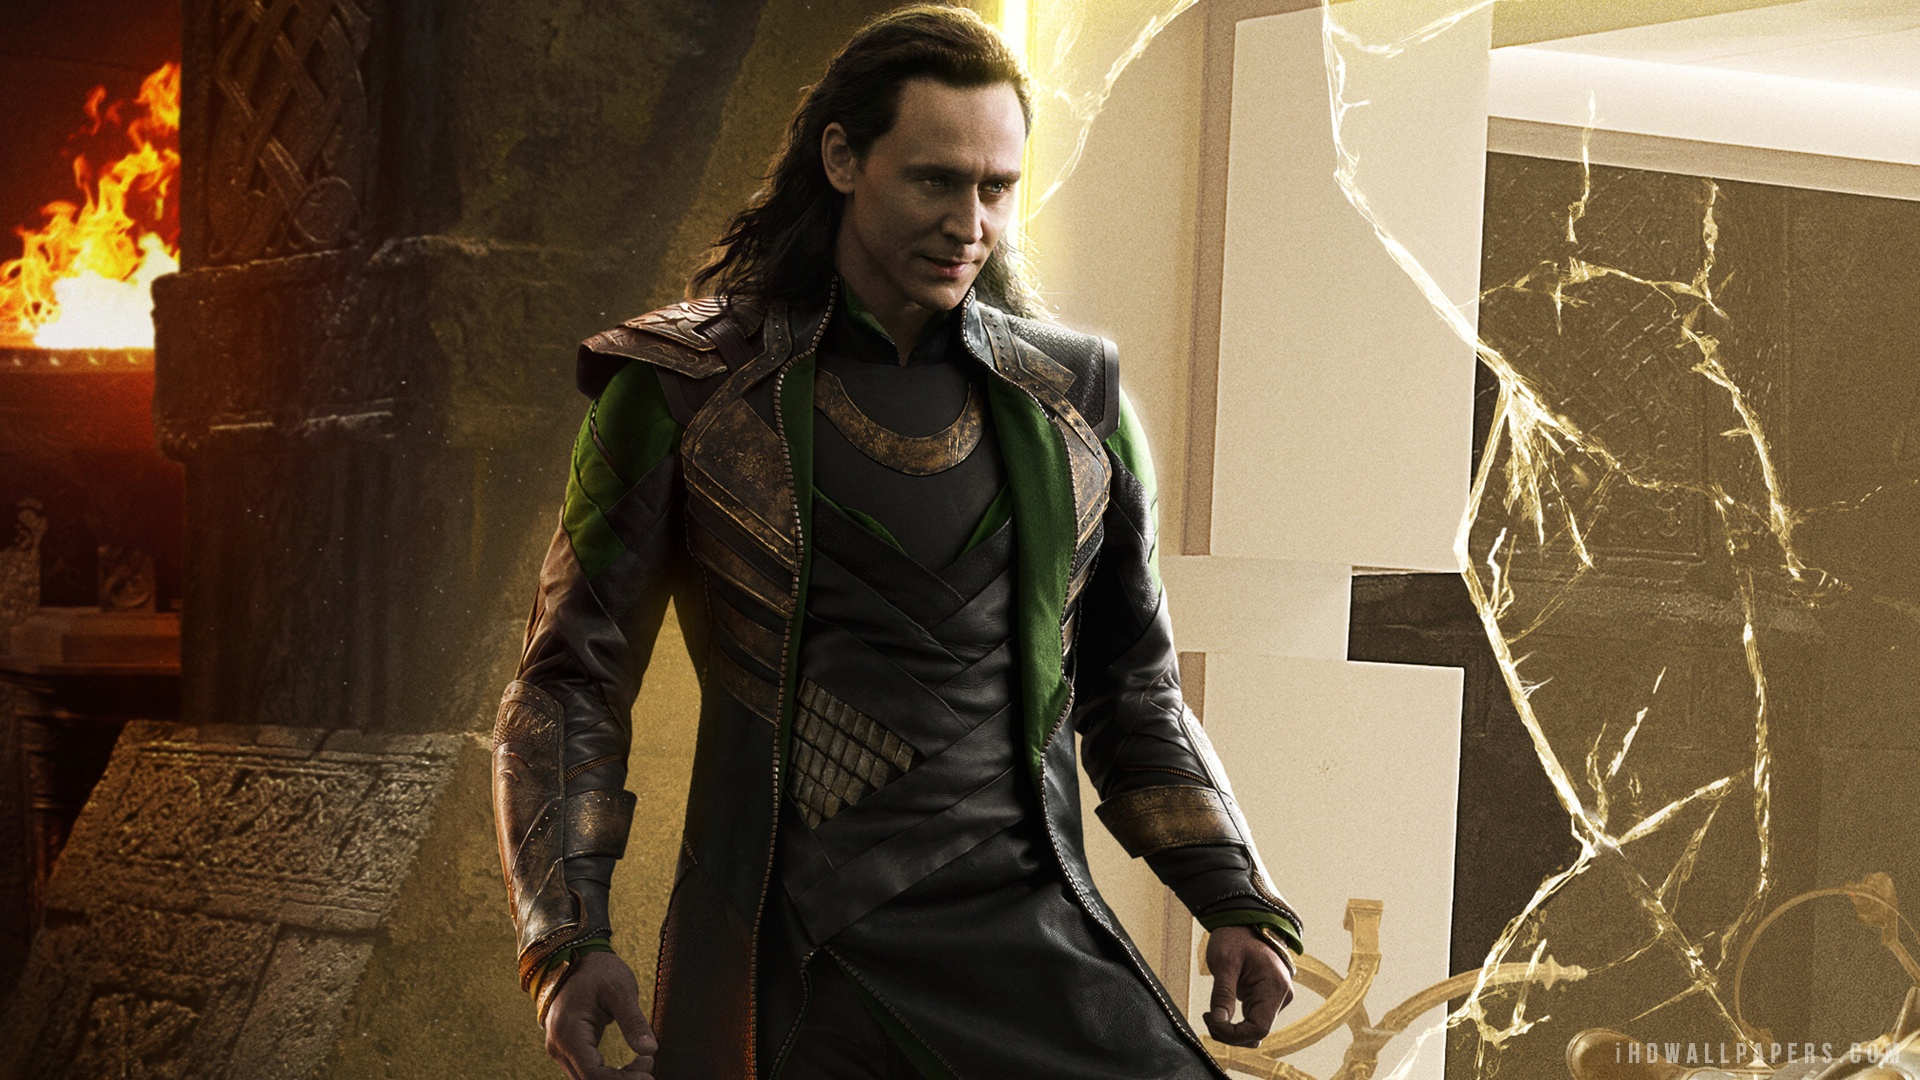 Most Inspiring Wallpaper Marvel Loki - thor-and-loki-wallpaper-24  Trends_1001865.jpg